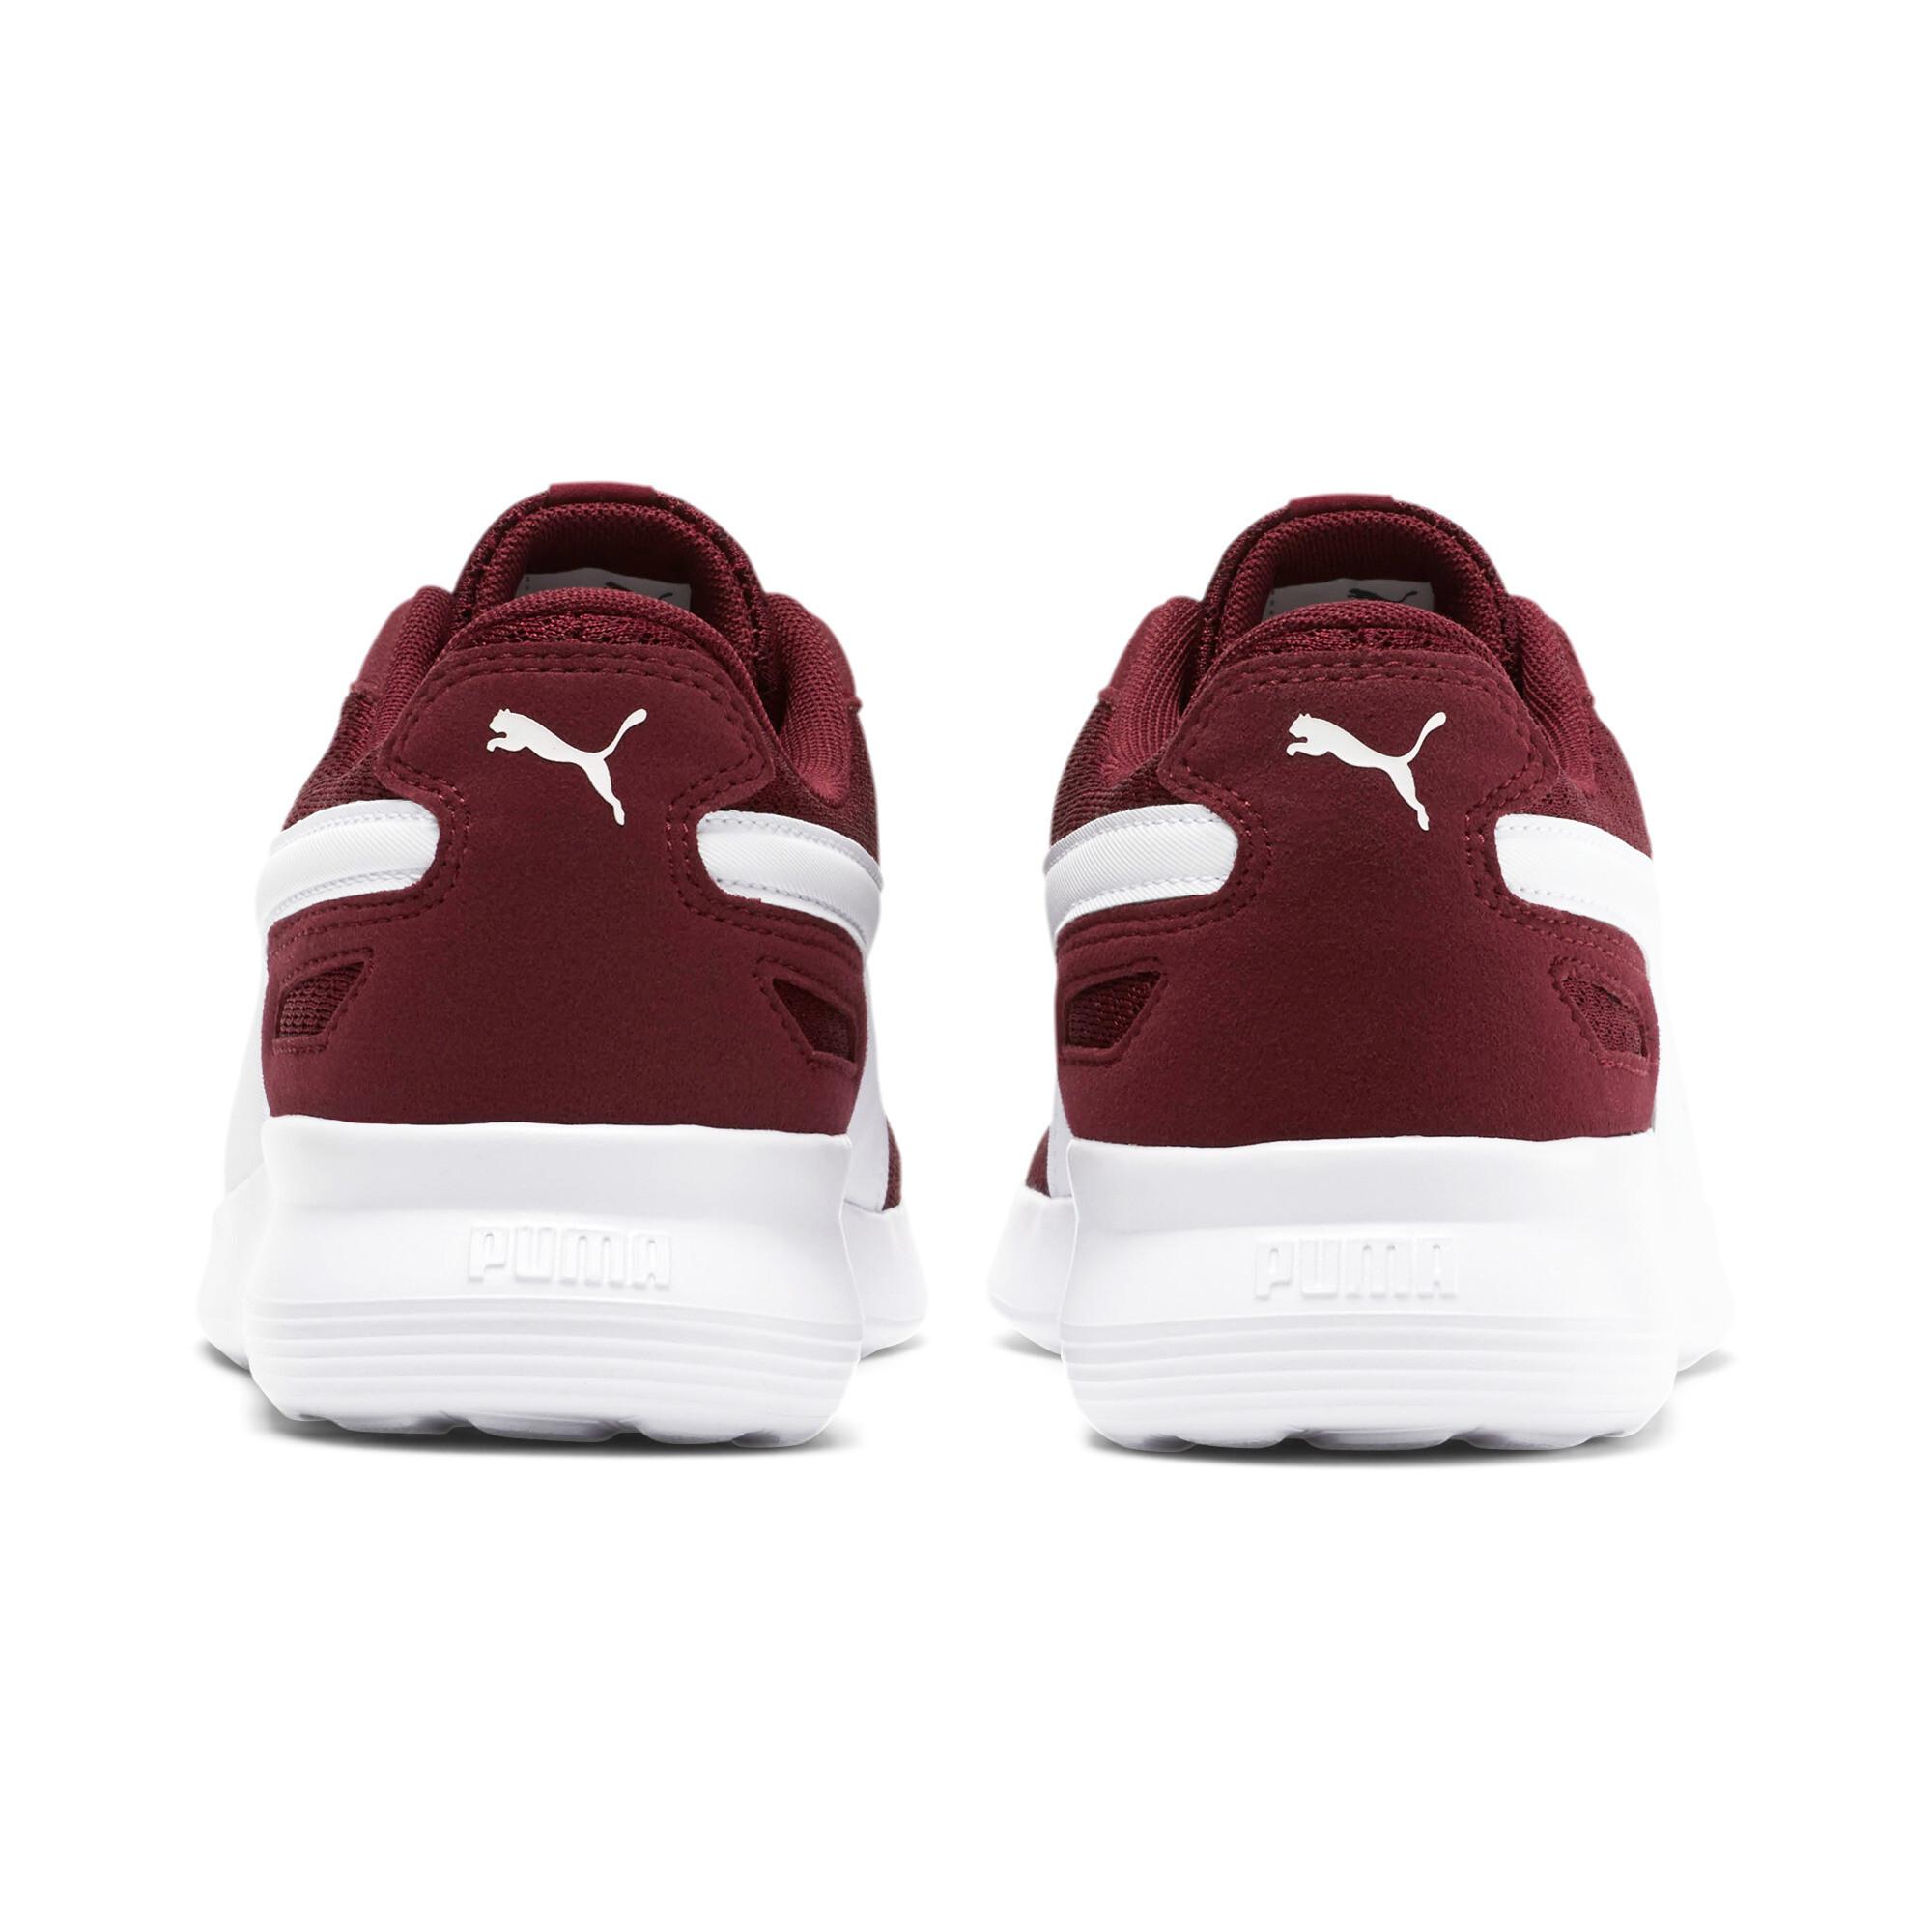 PUMA-Men-039-s-ST-Activate-Sneakers thumbnail 13